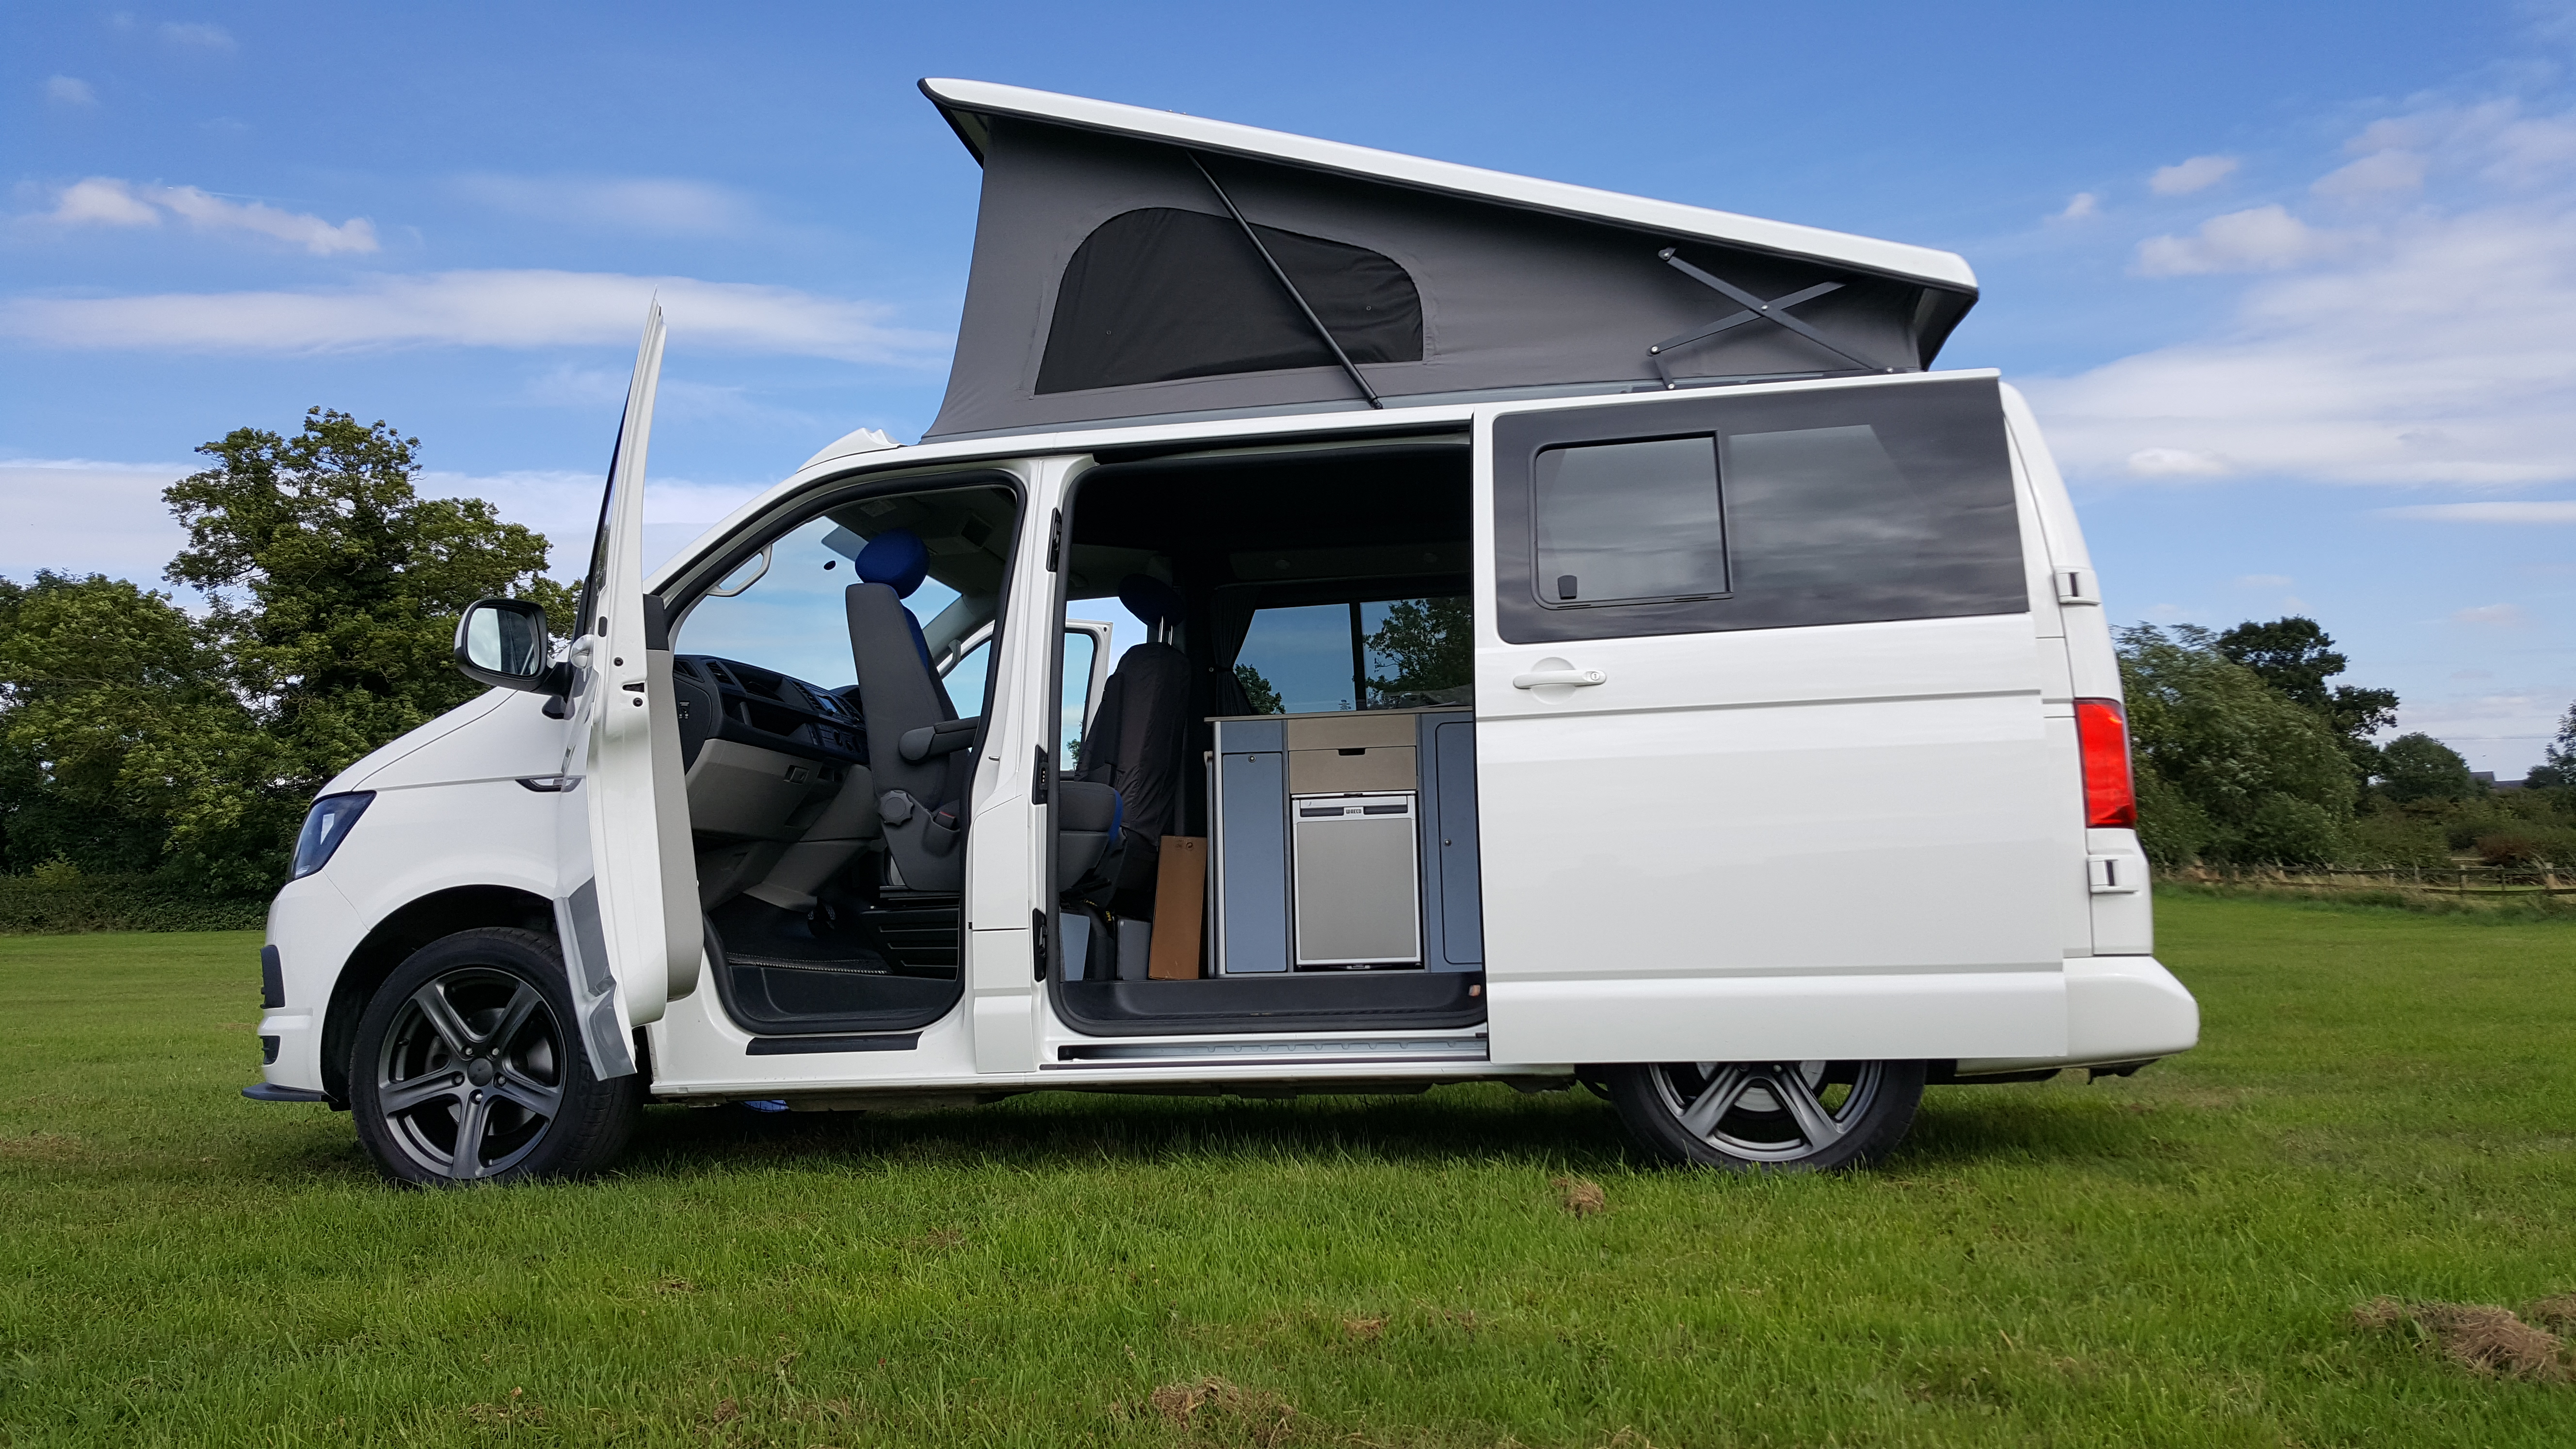 campers sky campervan conversions t6 camper reimo installers approved van vw volkswagen